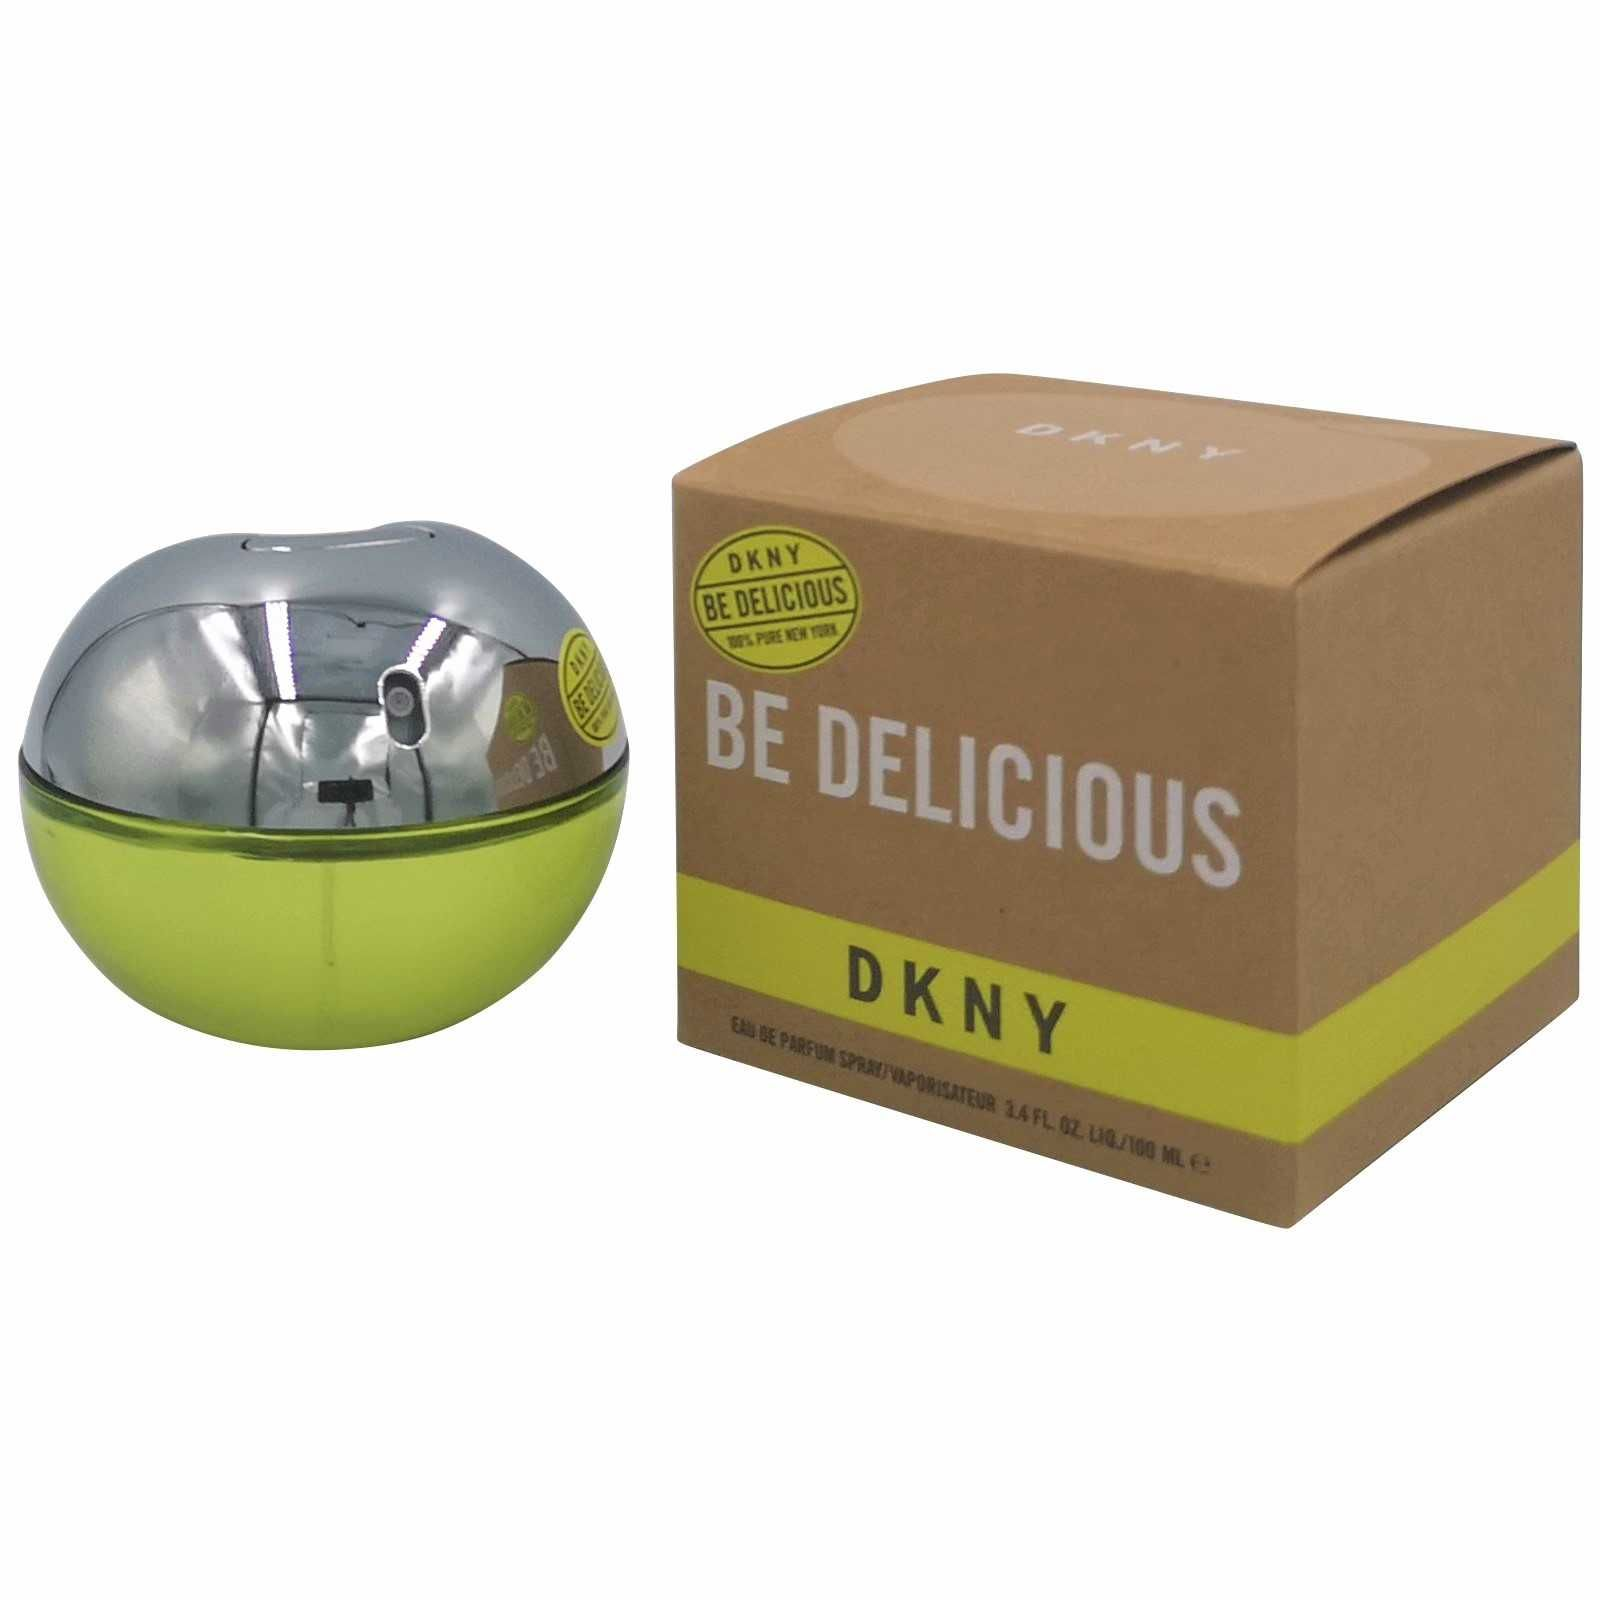 Perfumy | DKNY | Be Delicious | 100 ml | edp